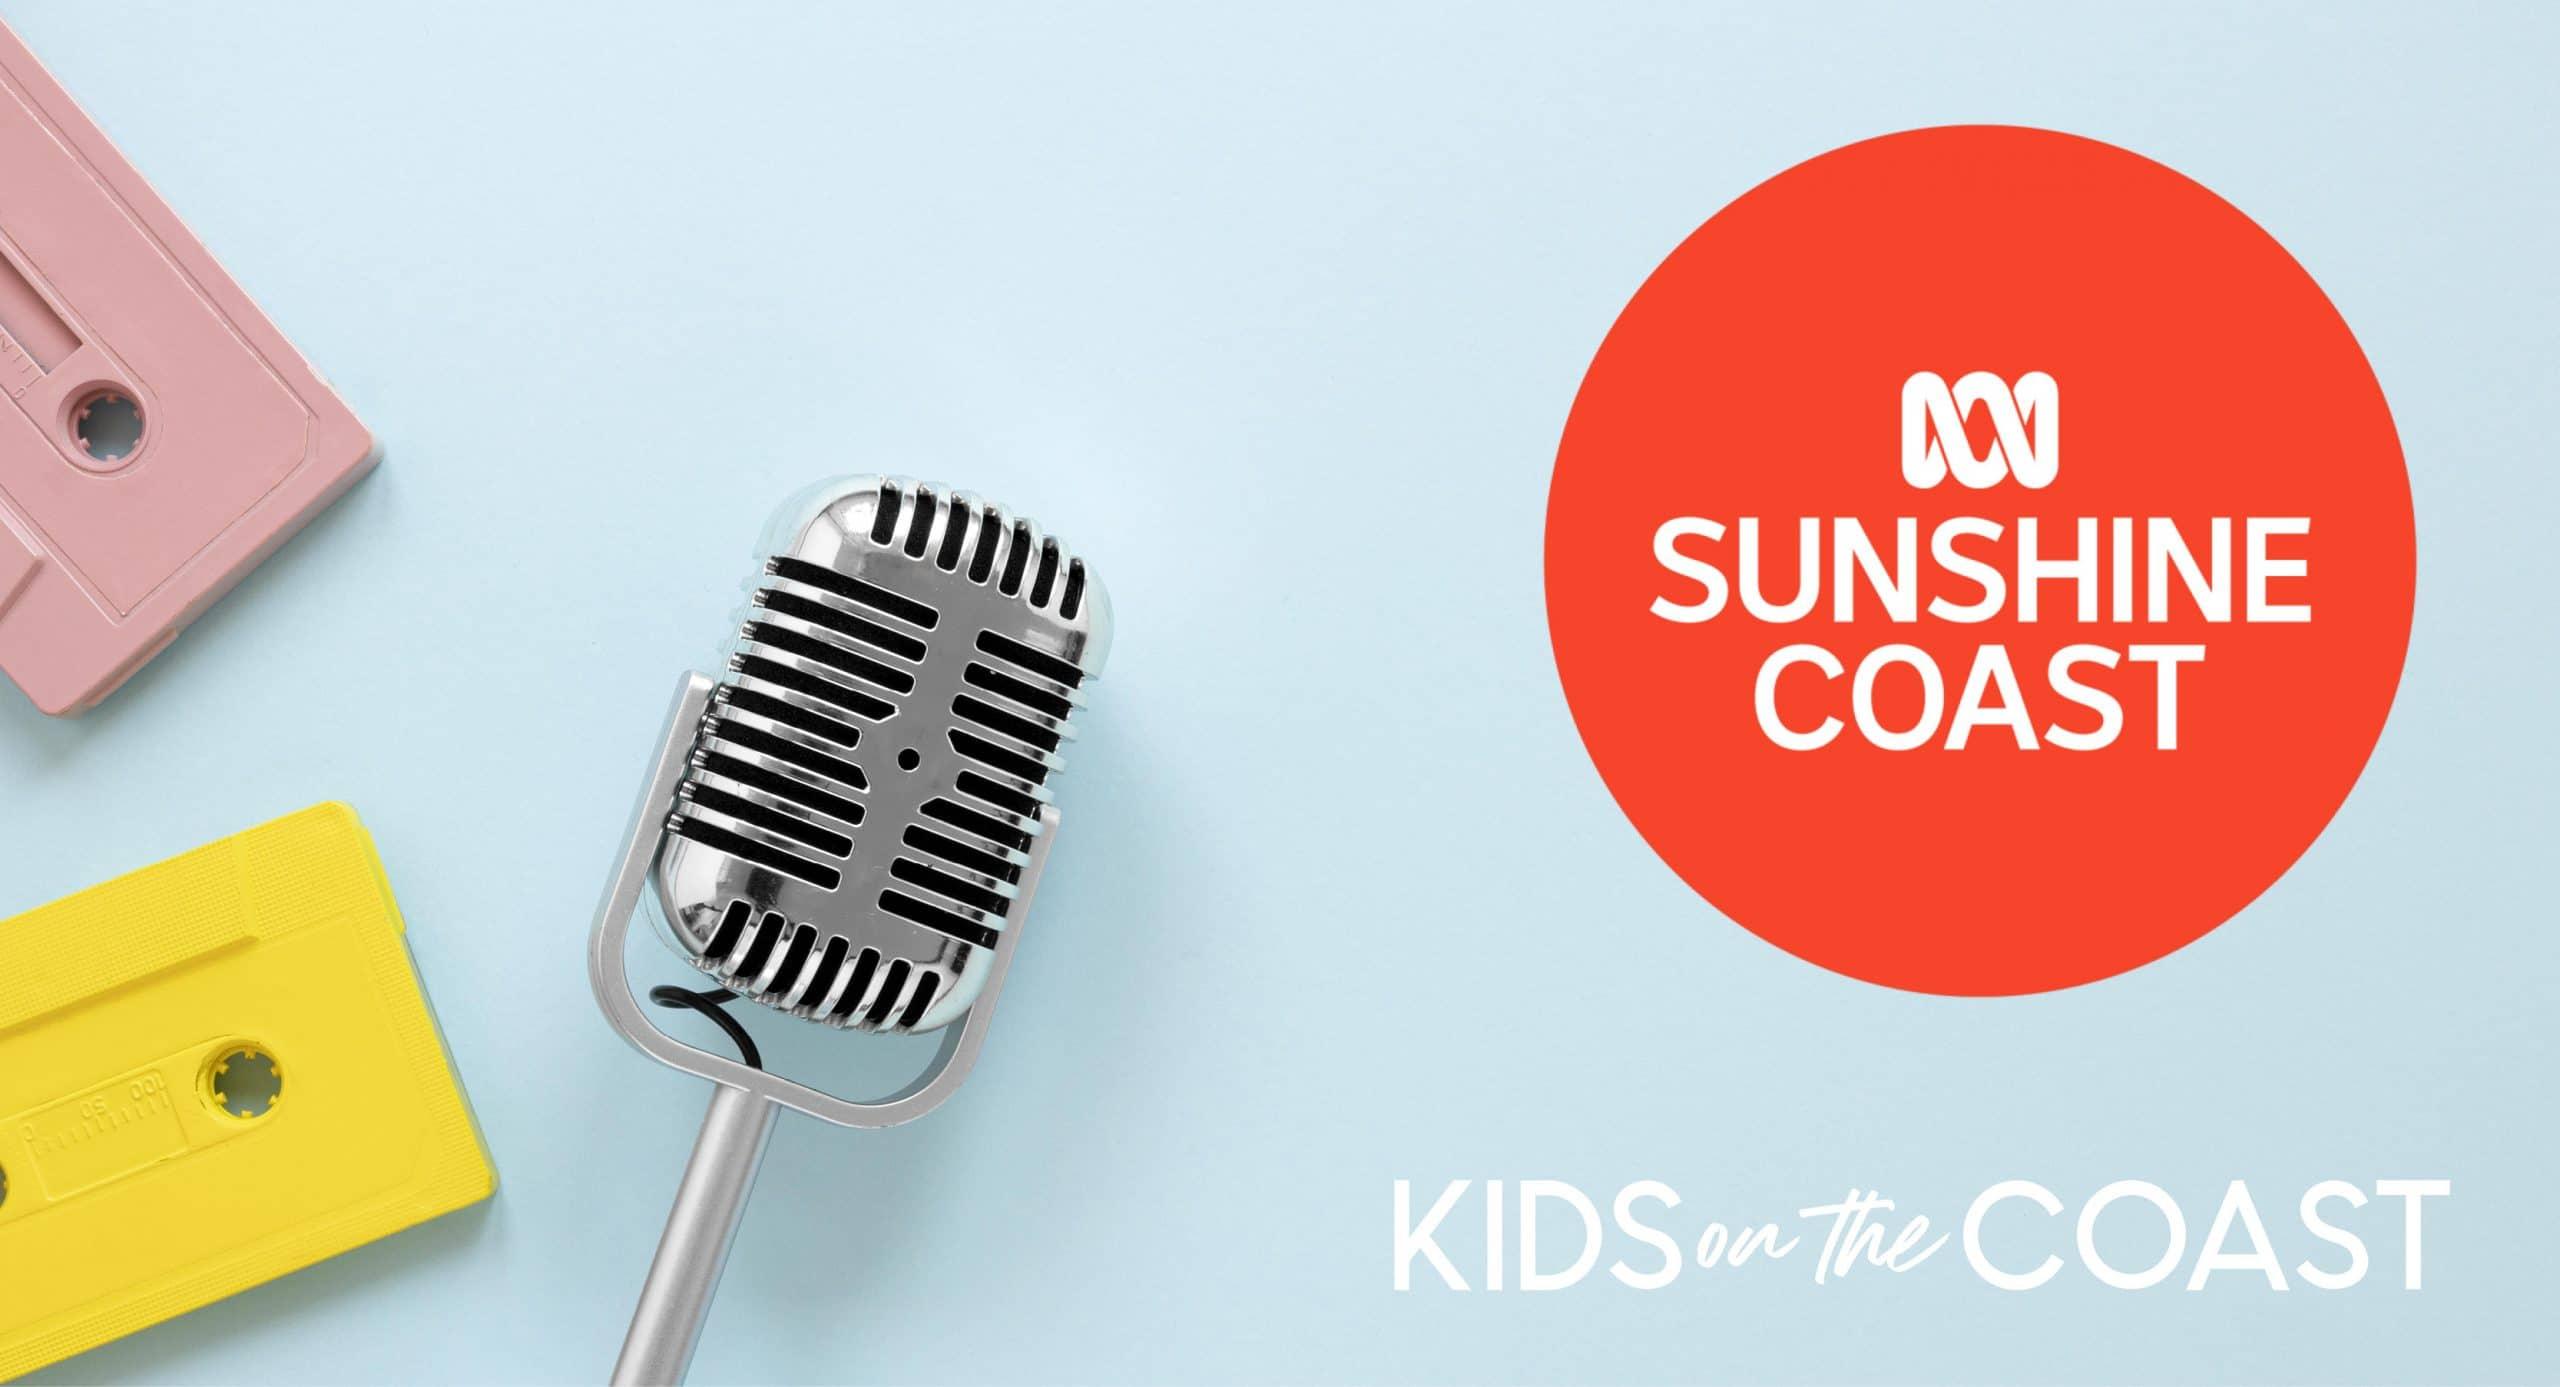 Kids on the Coast magazine interviewed on ABC Sunshine Coast